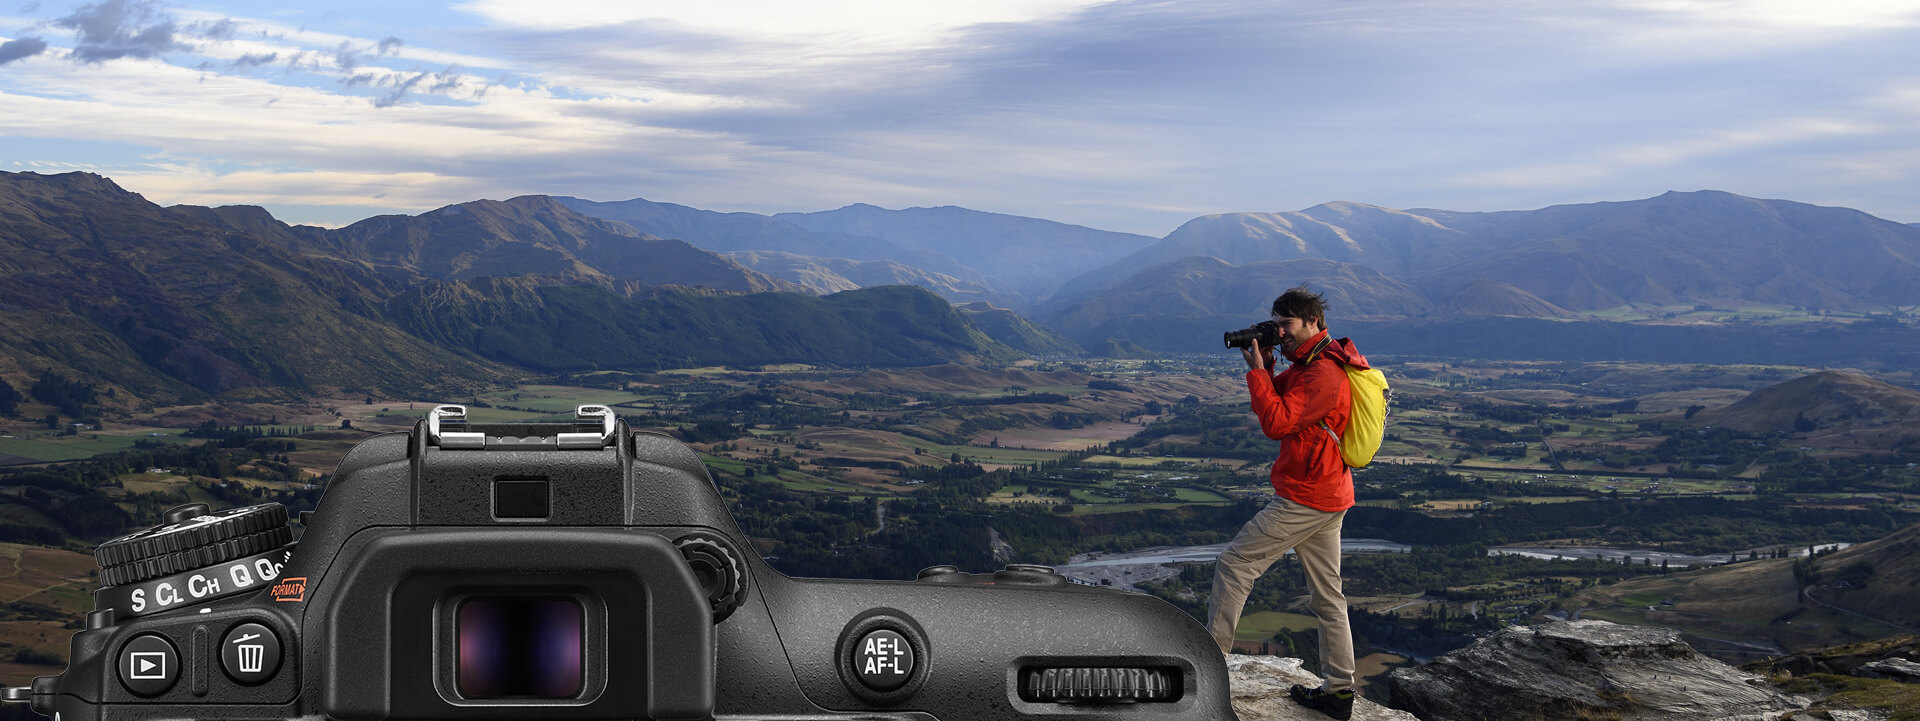 nikon_dslr_d7500_optical_viewfinder2.jpg